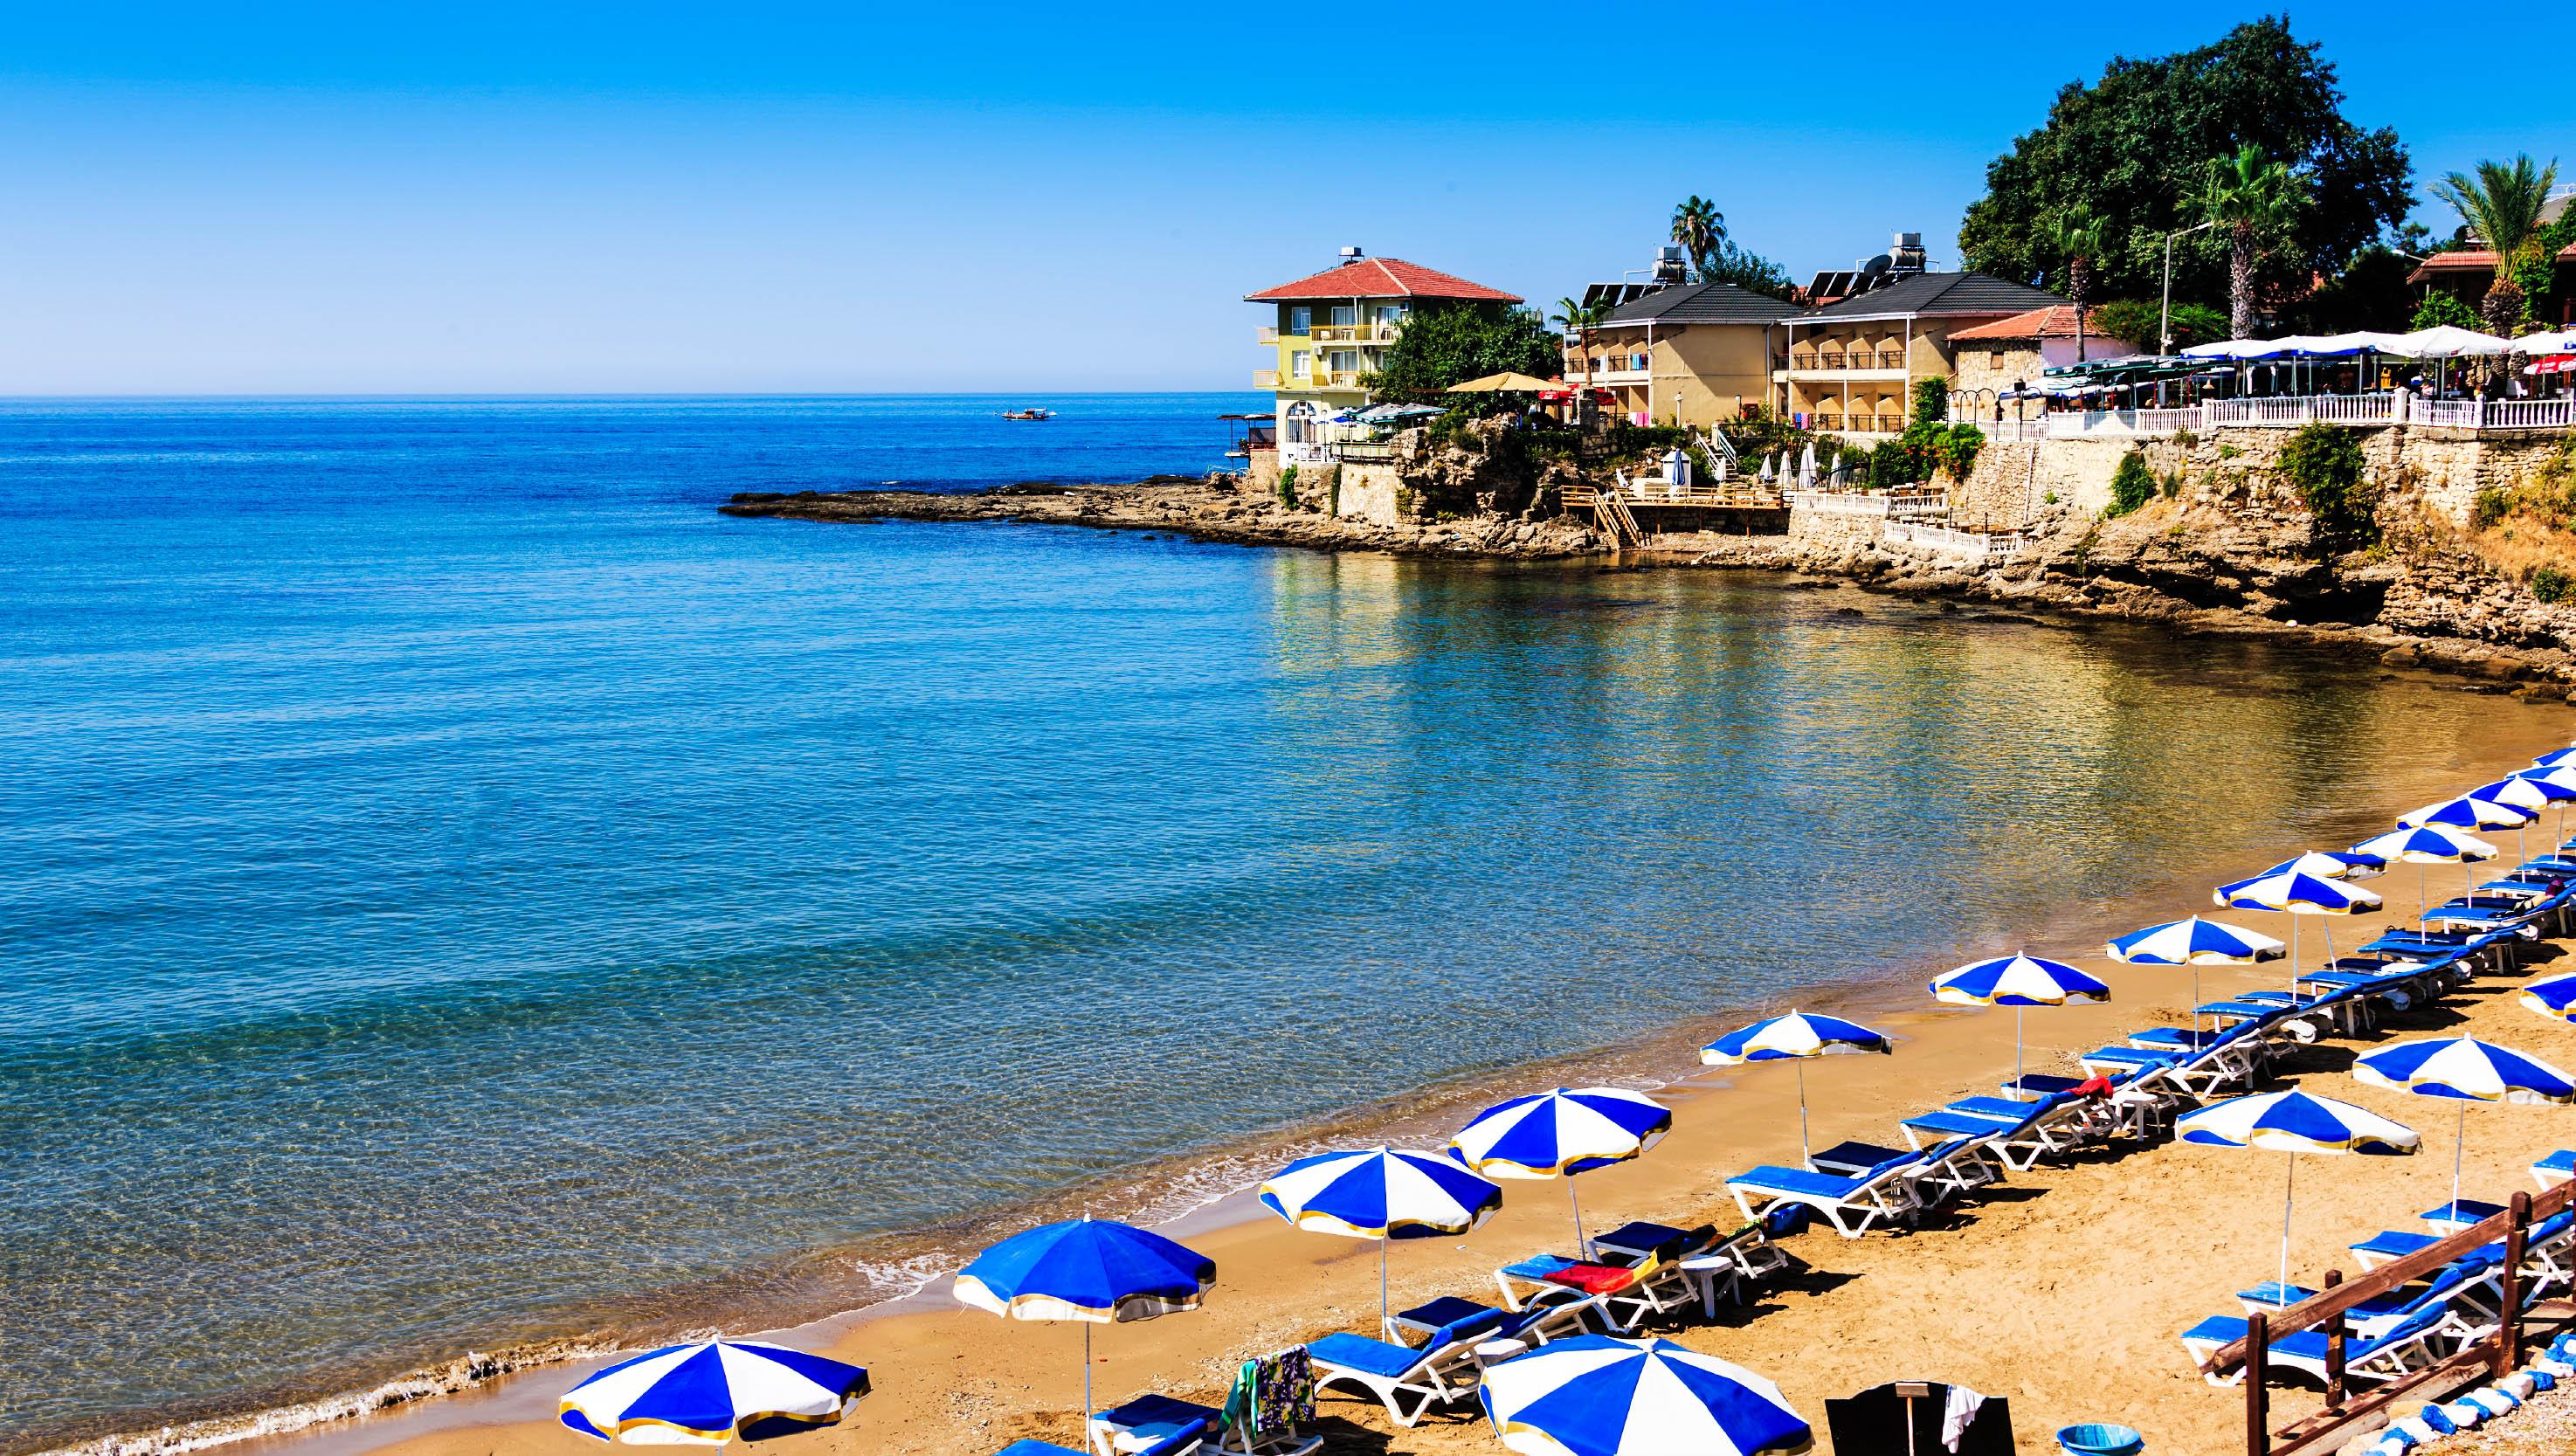 Cenger Beach Hotel Antalya